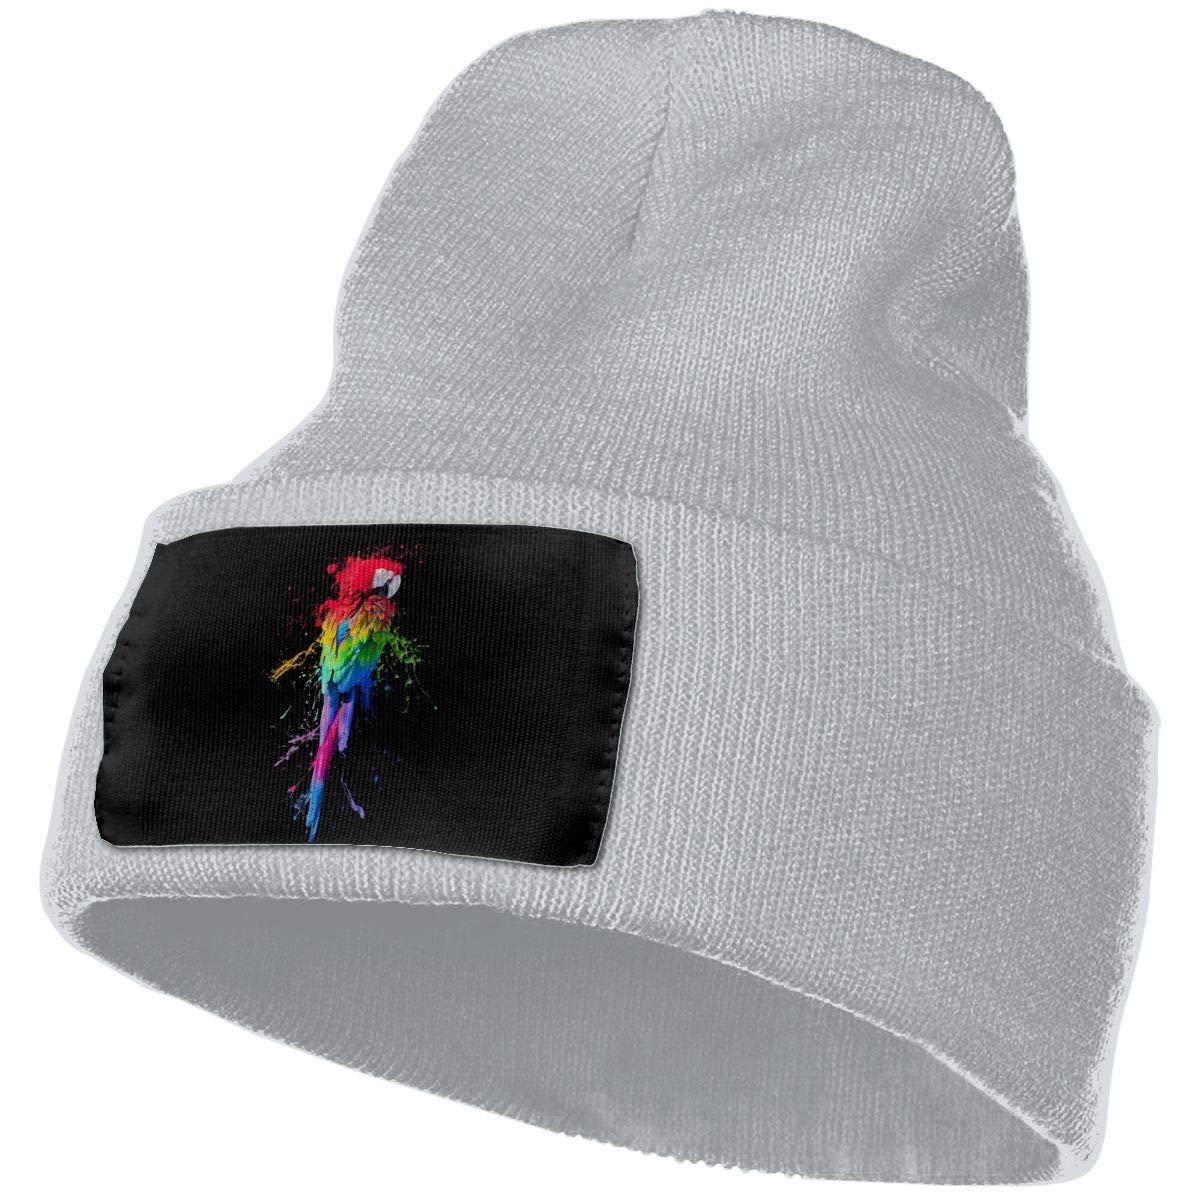 Parrot Color Splash Men/&Women Warm Winter Knit Plain Beanie Hat Skull Cap Acrylic Knit Cuff Hat